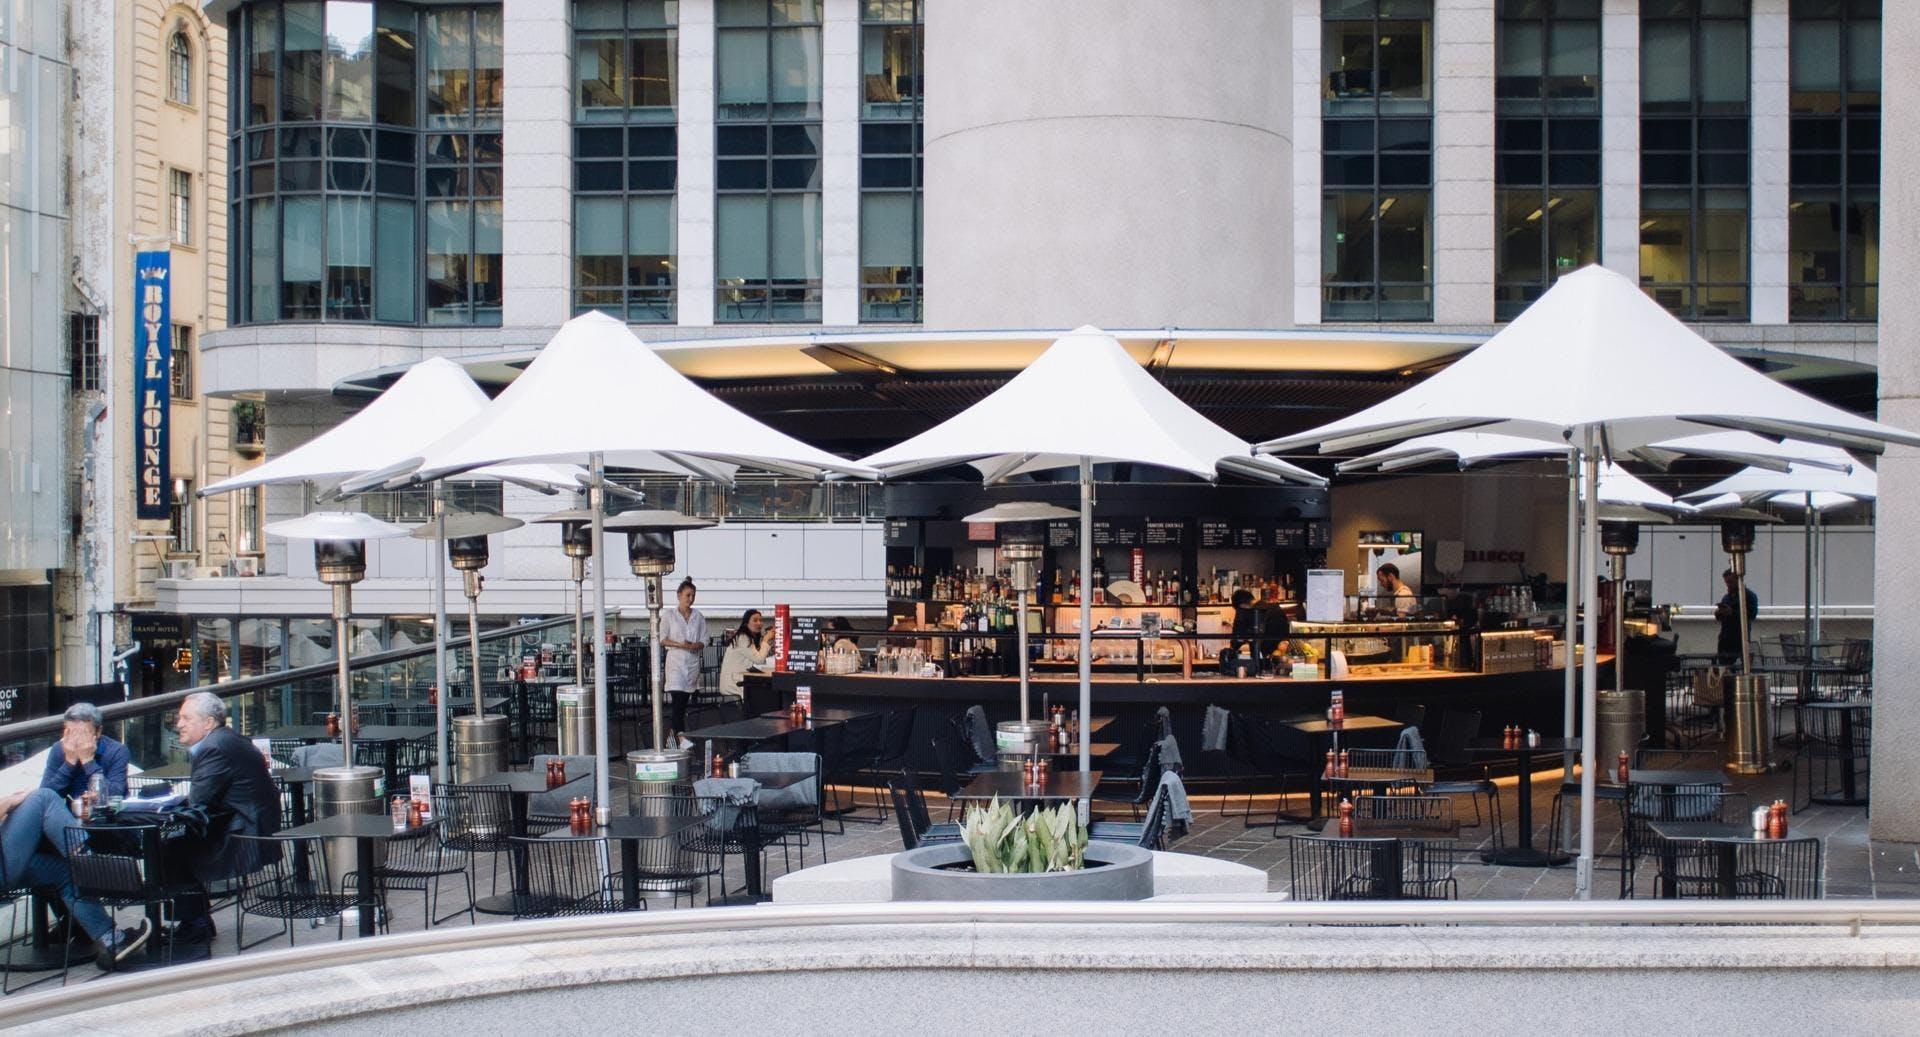 Photo of restaurant Bellucci Cucina in Sydney CBD, Sydney